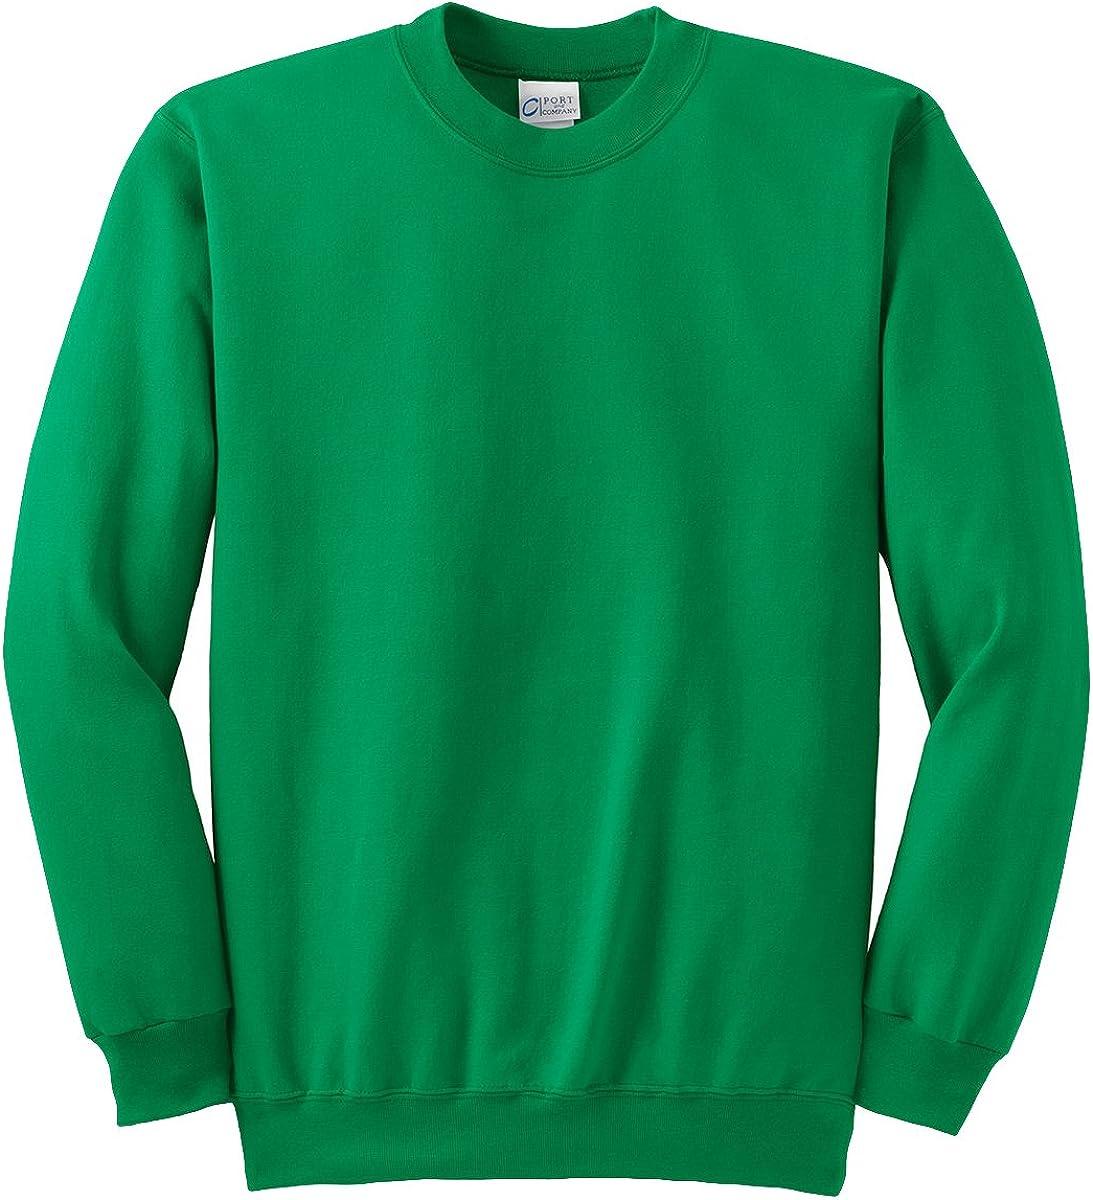 Port /& Company Mens Tall Ultimate Crewneck Sweatshirt